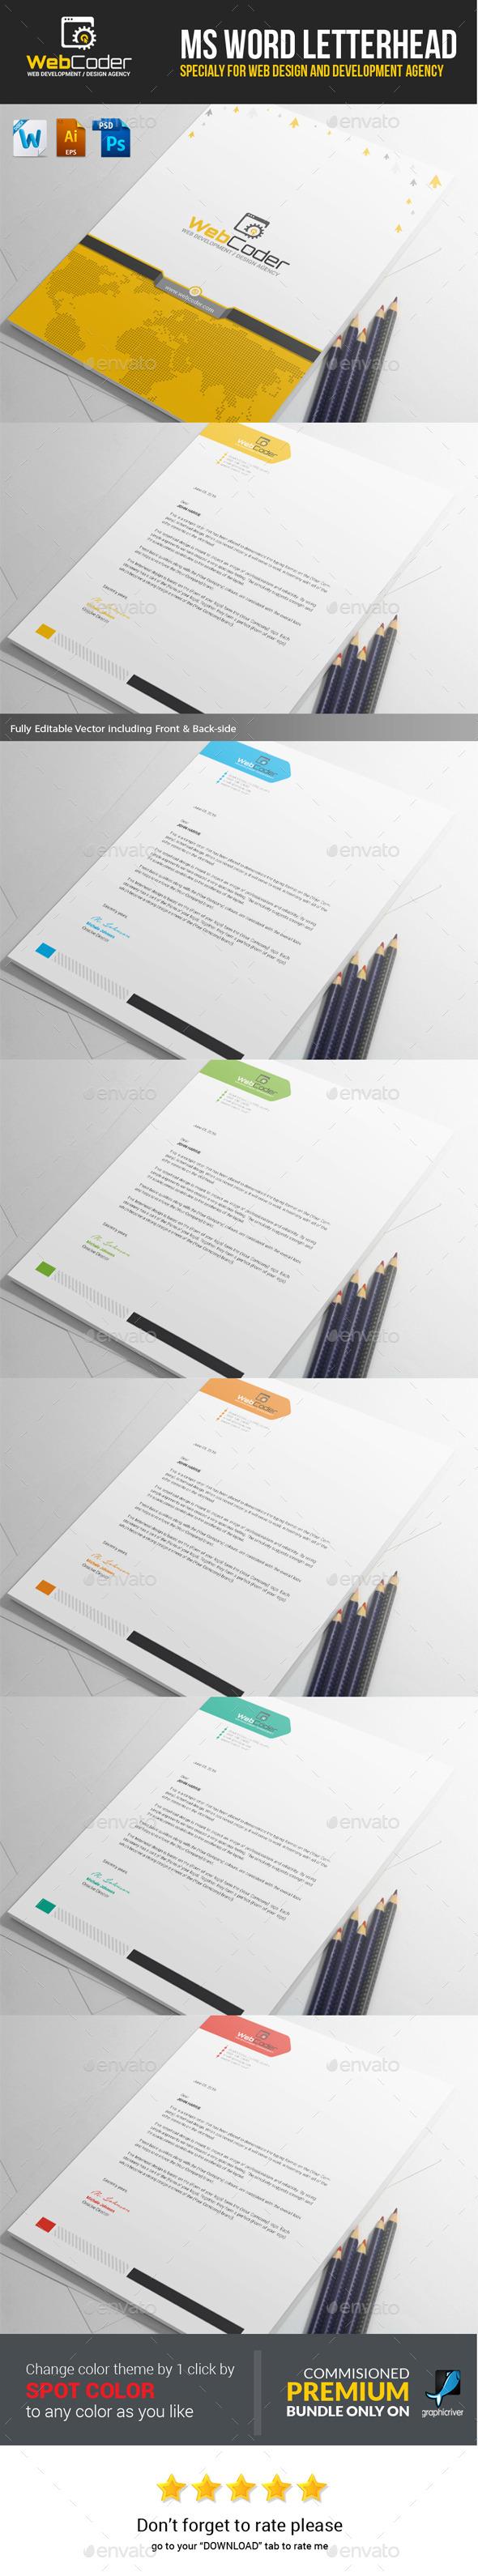 GraphicRiver Web Coder Web Design Agency Ms Word Letterhead 11827490